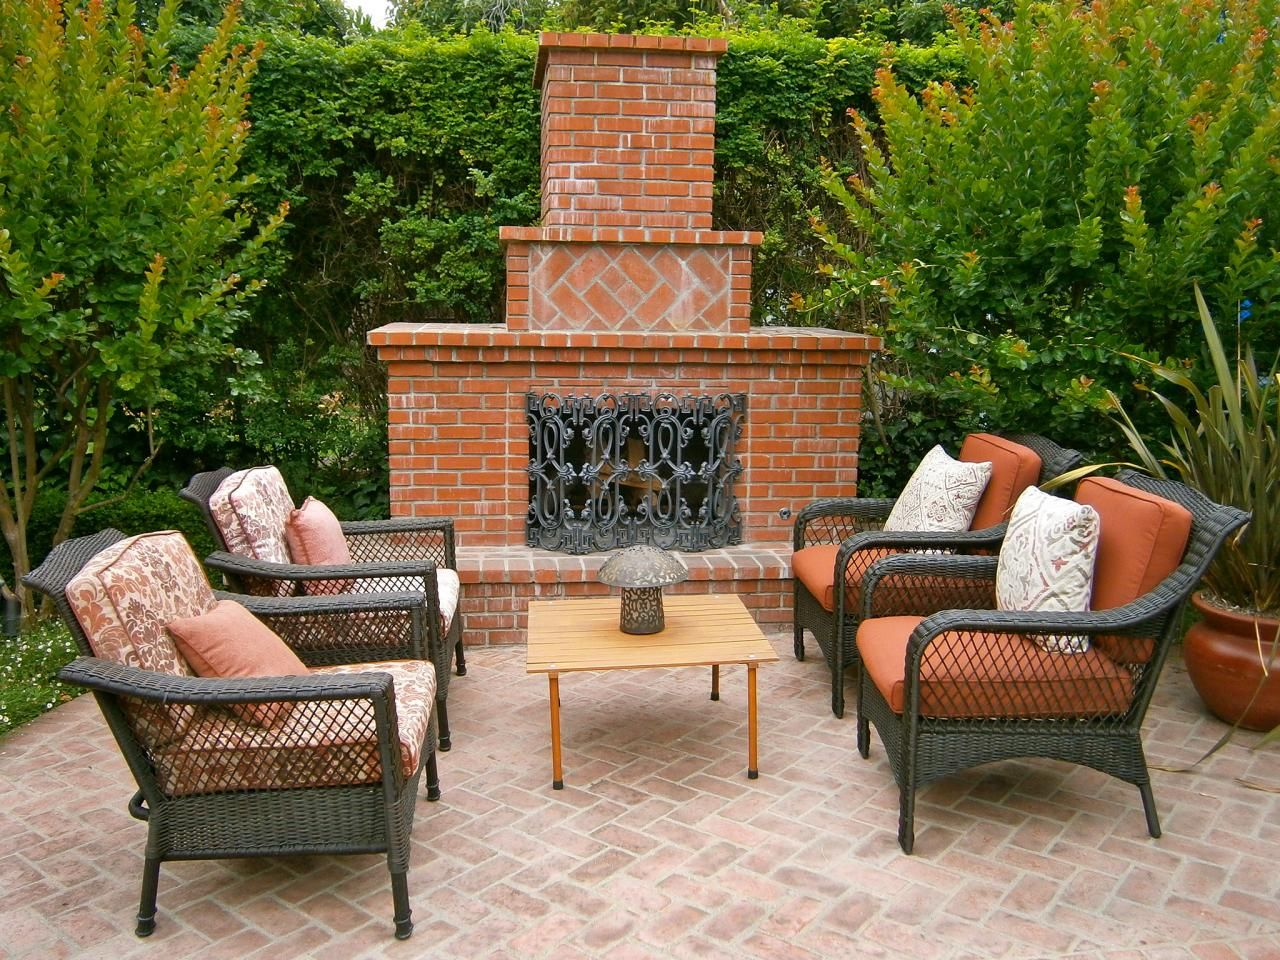 Outdoor Brick Fireplaces Outdoor Fireplace Outdoor Wood Burning